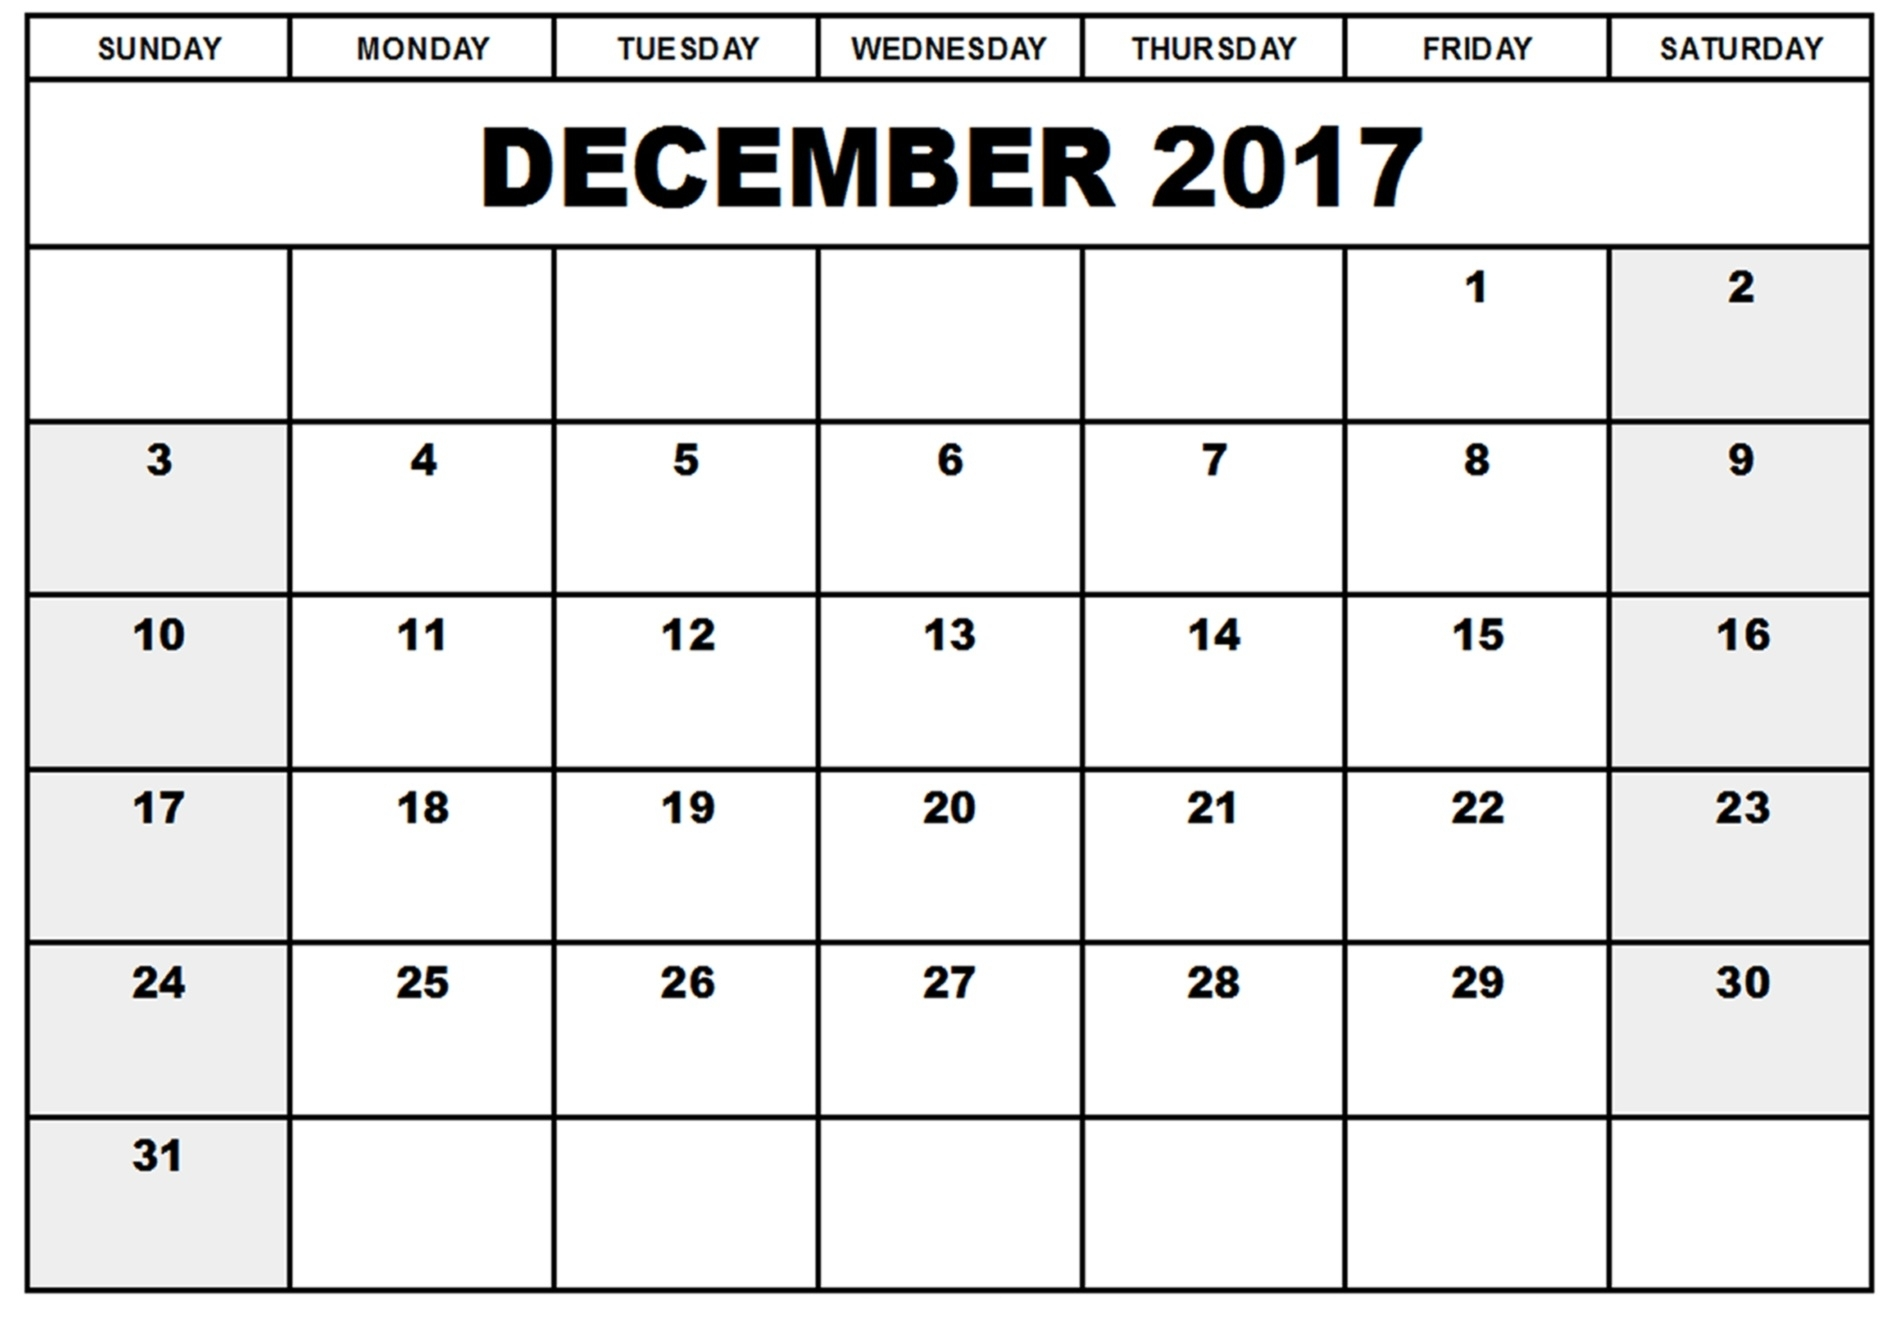 Dec 2017 Printable Calendar | Hauck Mansion intended for Printable Nov Dec 17 Calendar